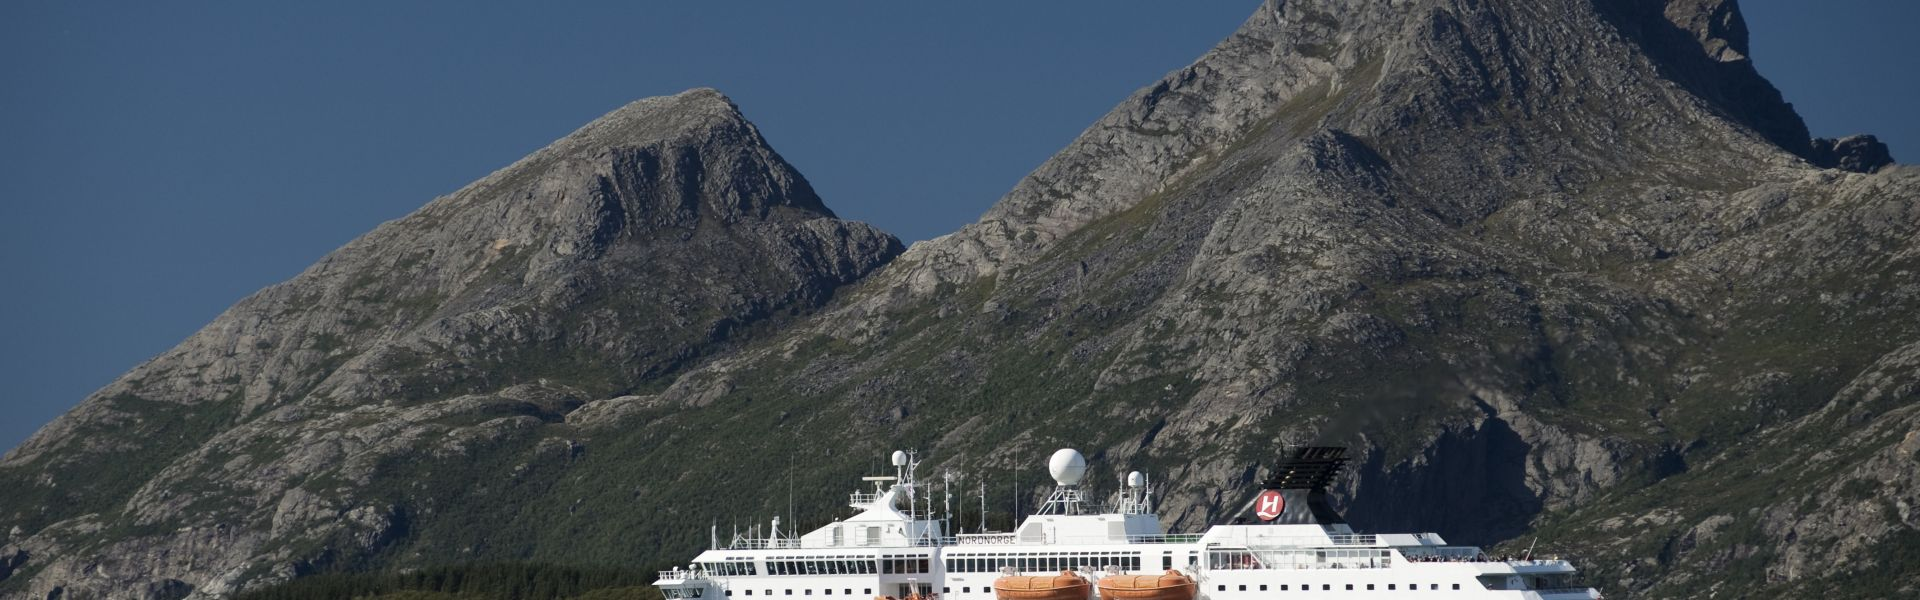 Croaziera 2017 - Scandinavia si Fiordurile Norvegiene (Bergen) - Hurtigruten - MS Nordnorge - 11 nopti